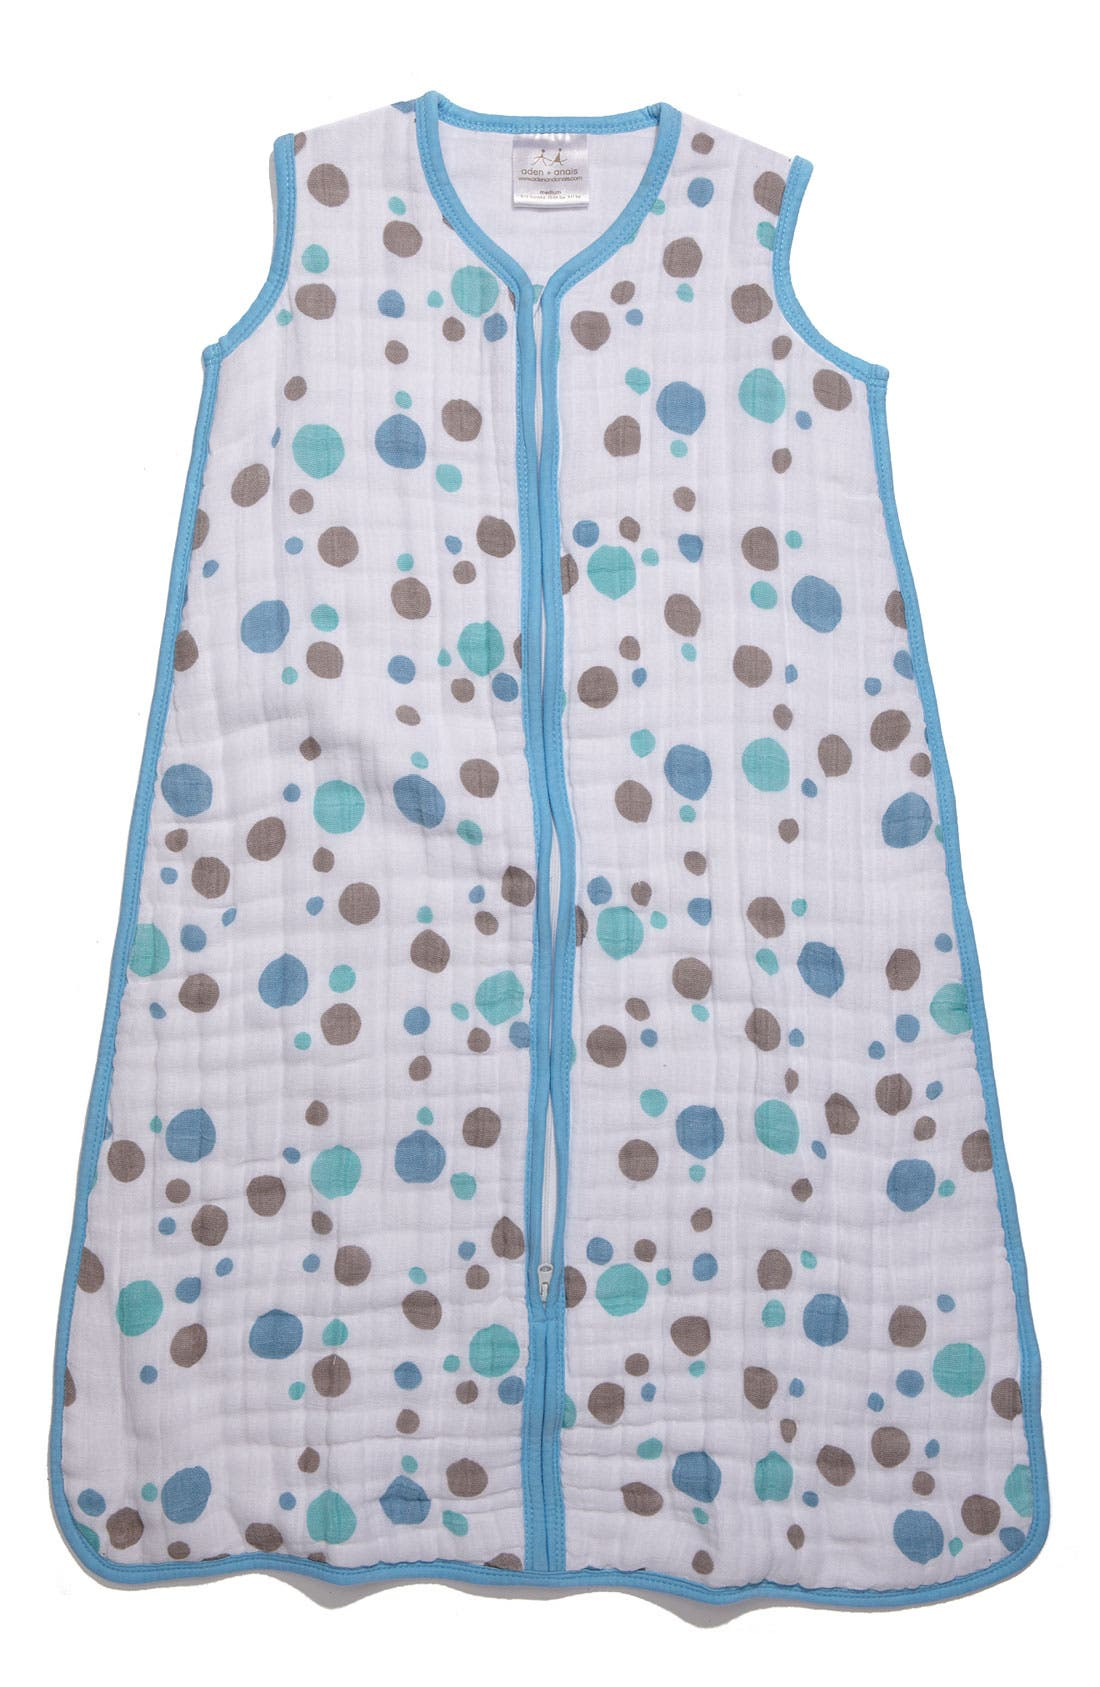 Main Image - aden + anais 'Cozy Sleeping Bag' Wearable Blanket (Baby)